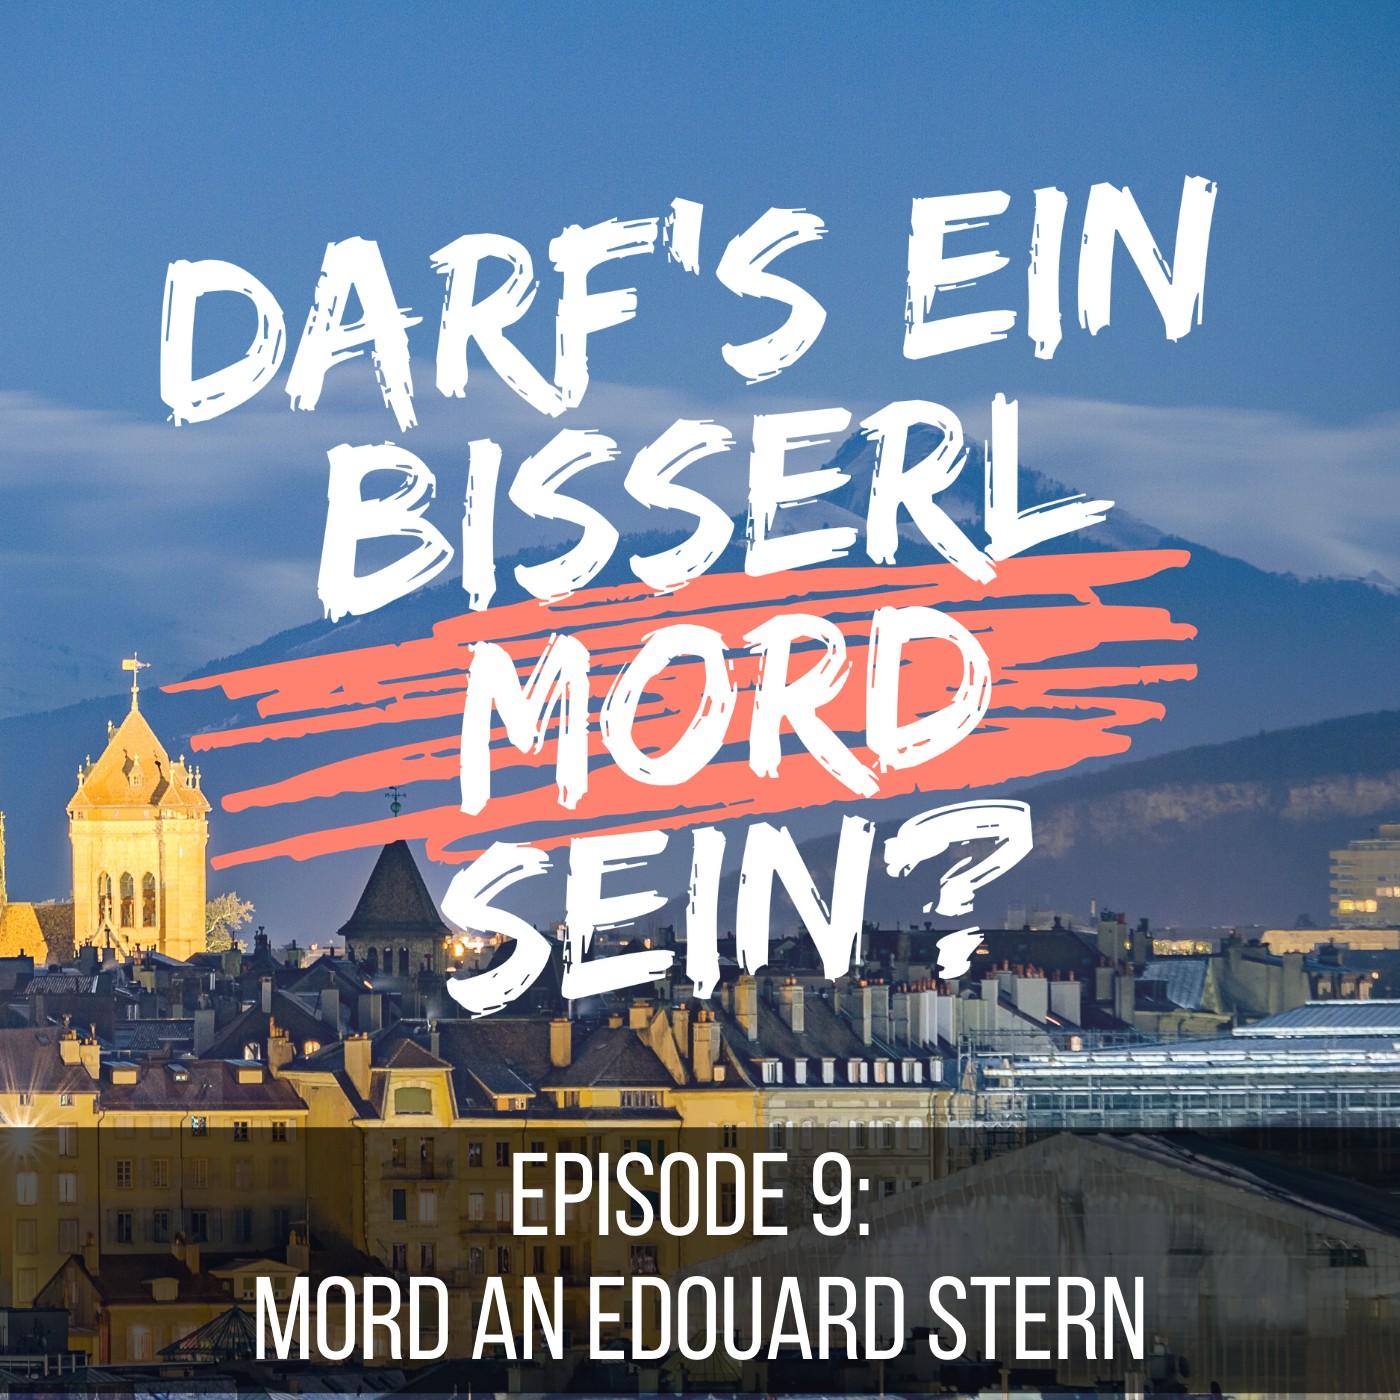 Episode 9: Mord an Edouard Stern